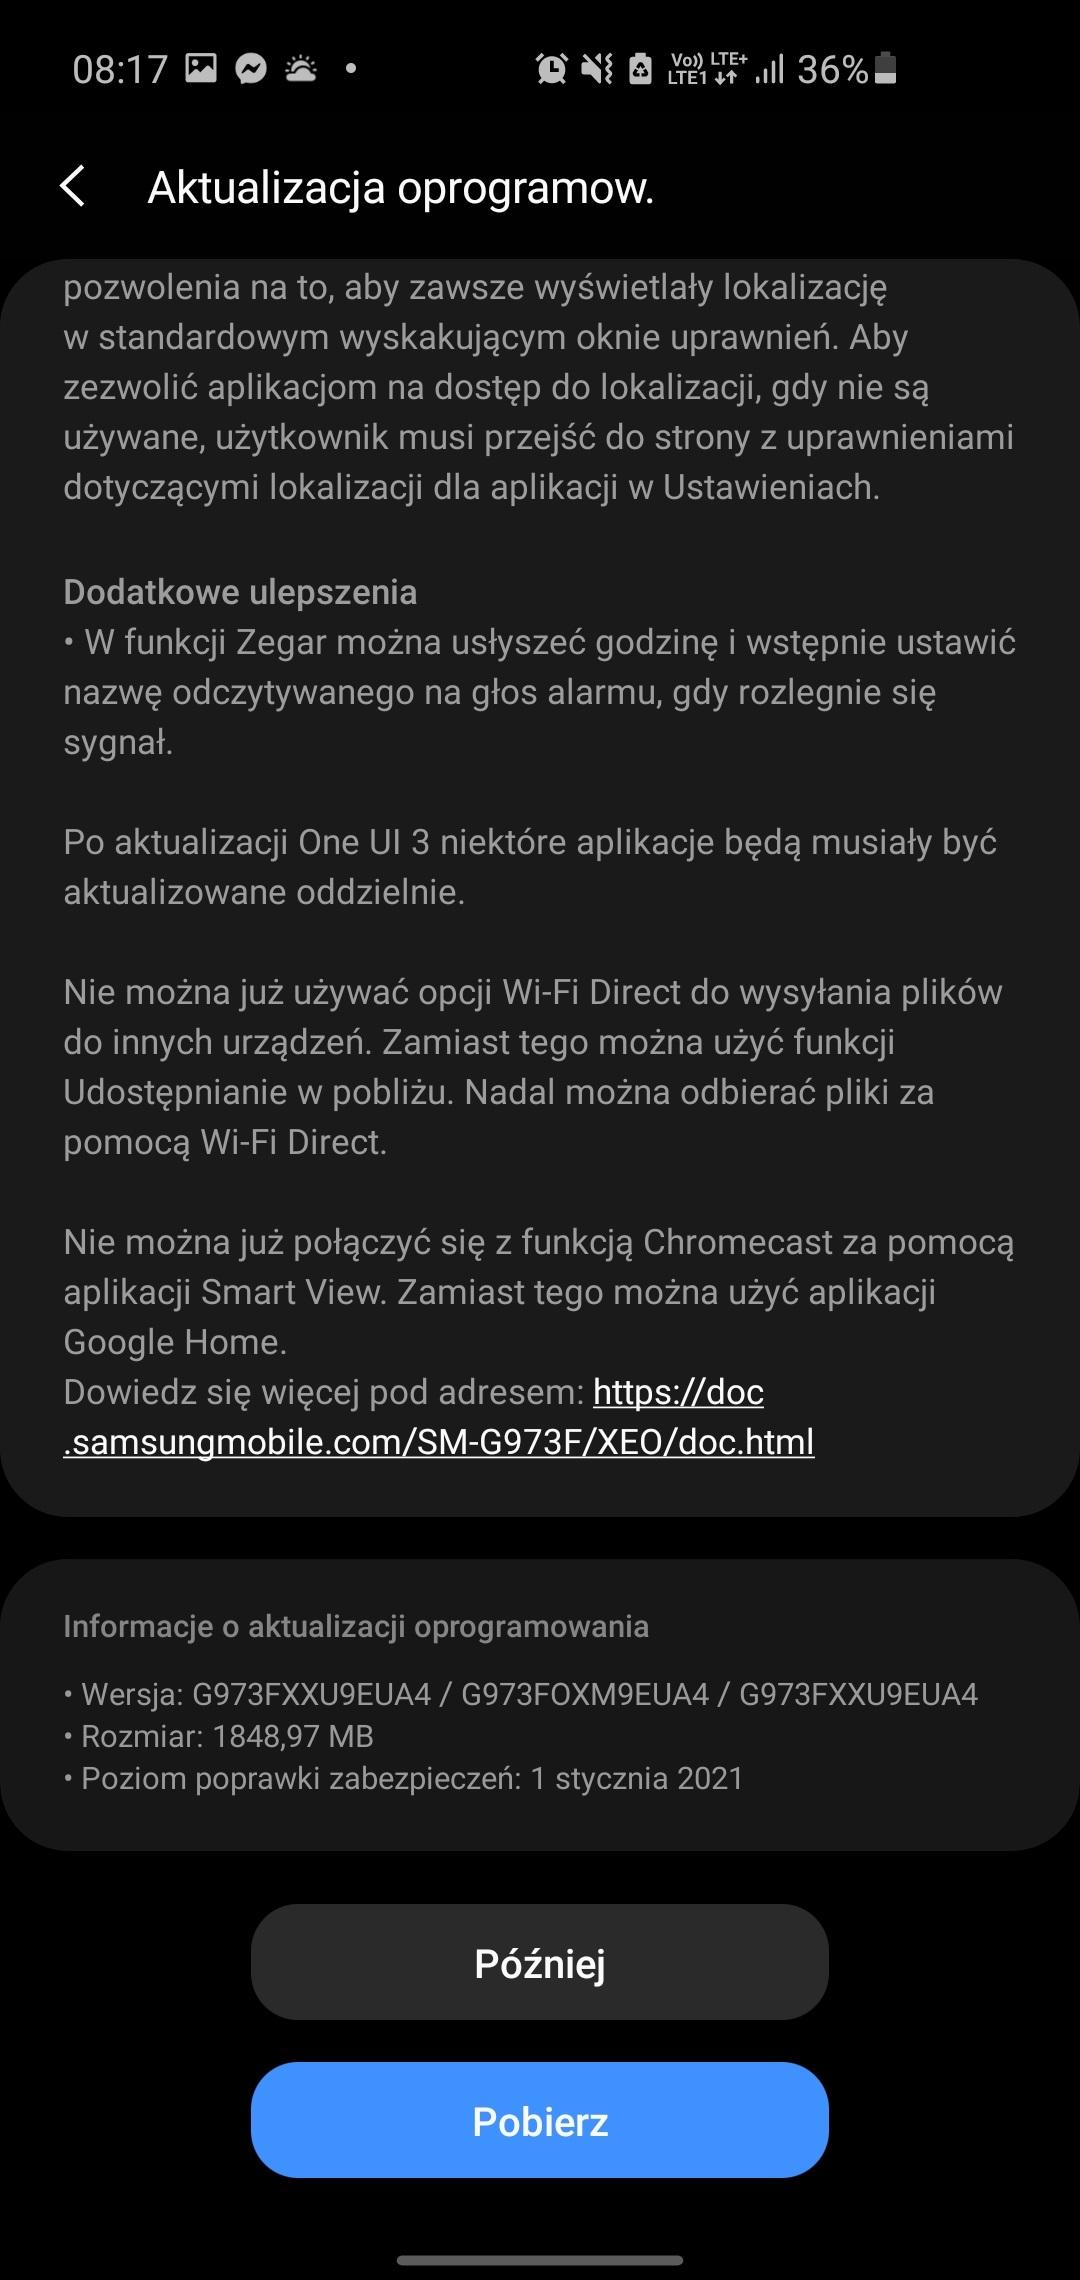 Samsung Galaxy S10 Android 11 One UI 3 aktualizacja